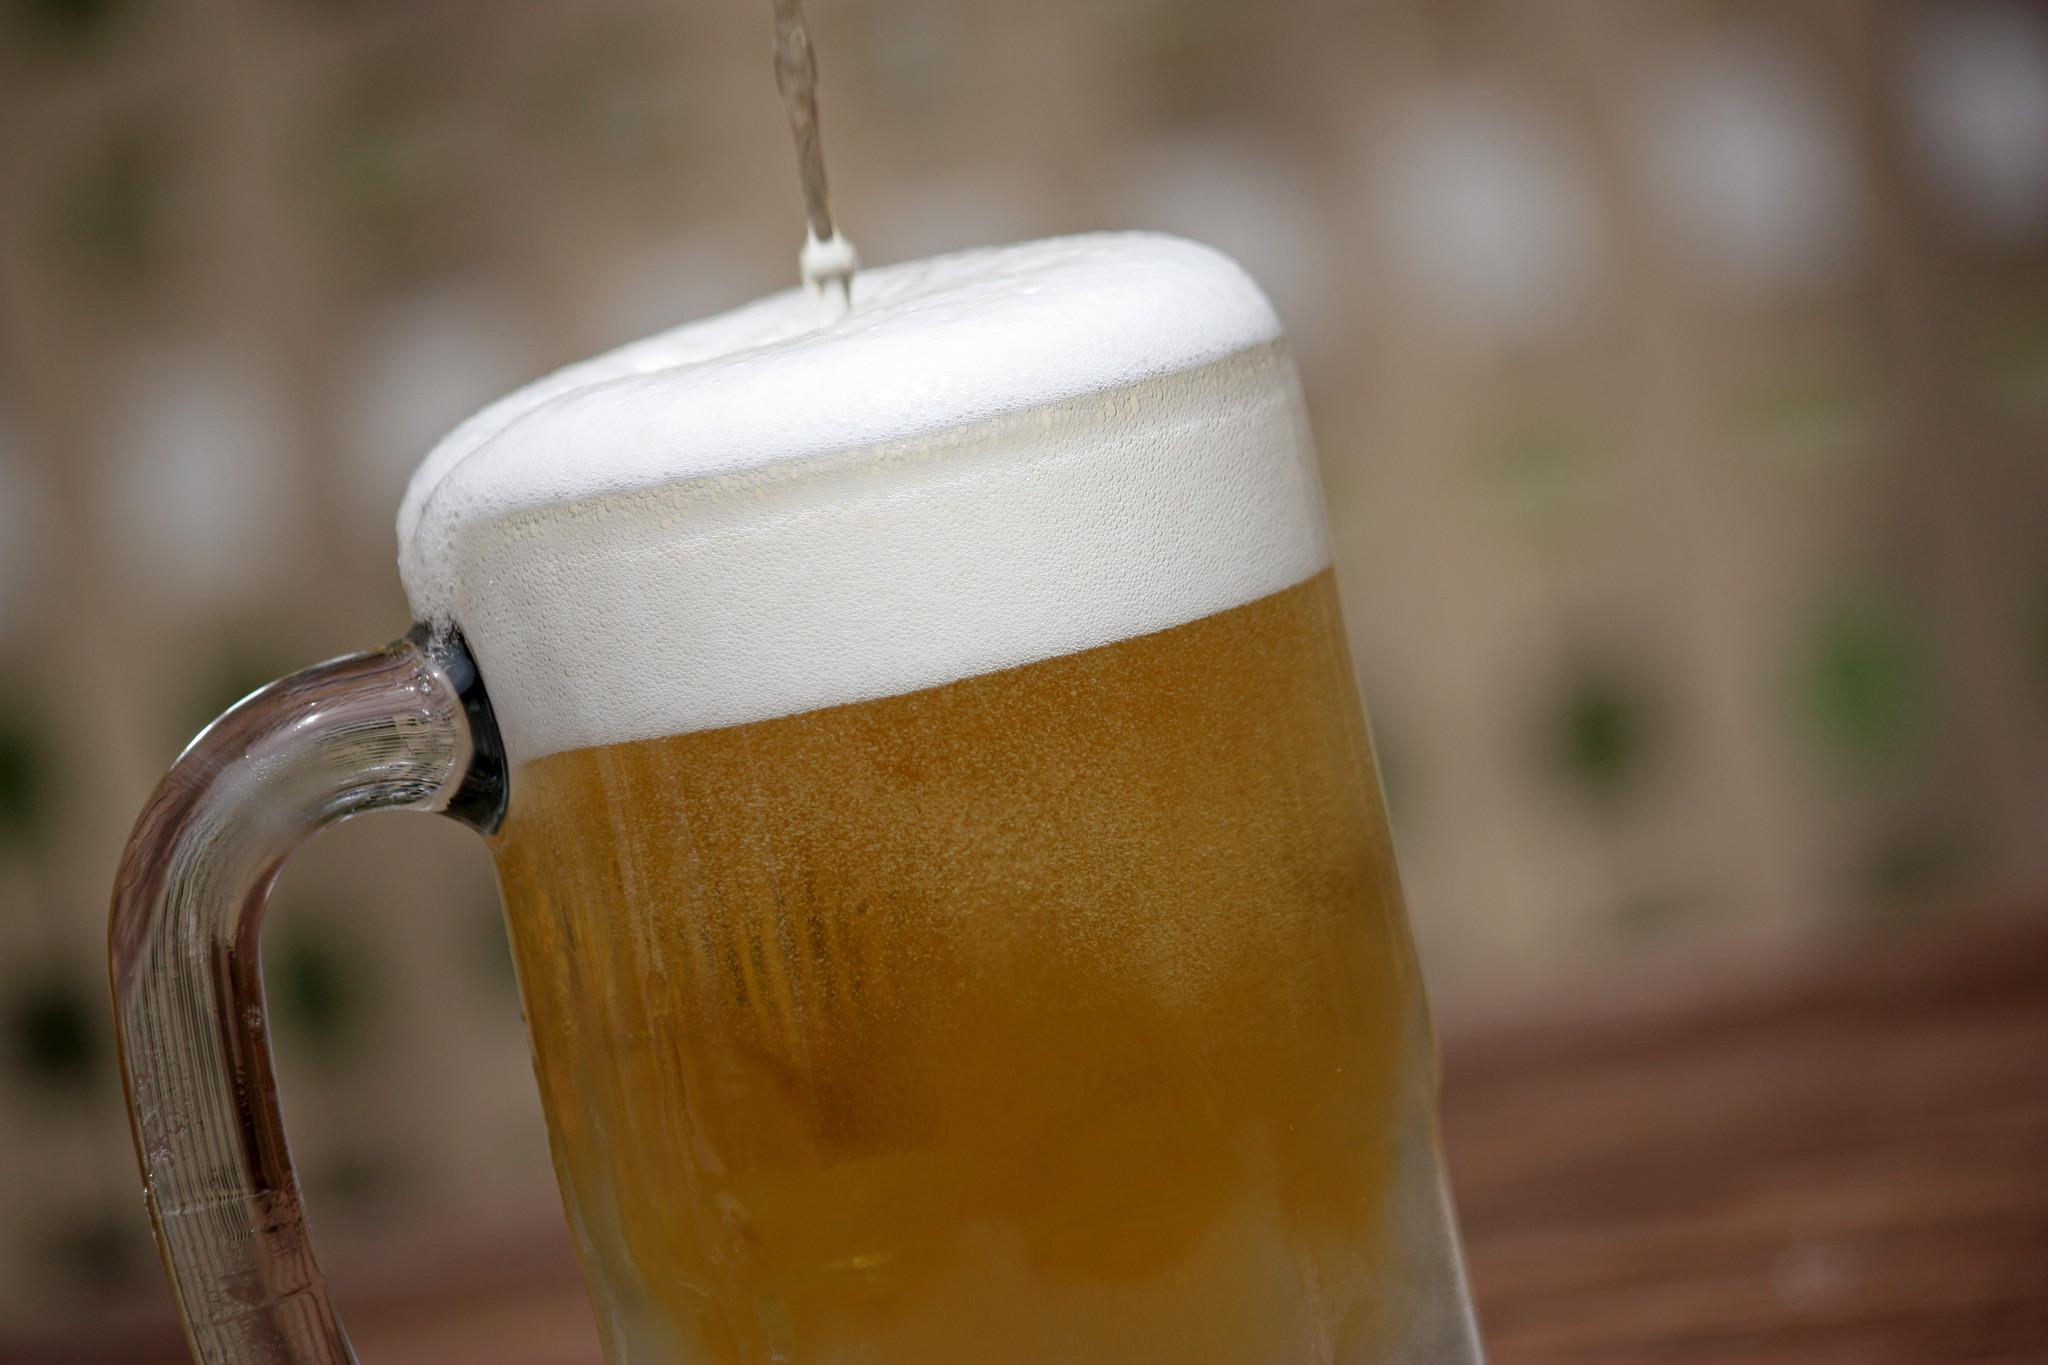 Busch Gardens Bier Fesy happens in September - The Virginia Gazette